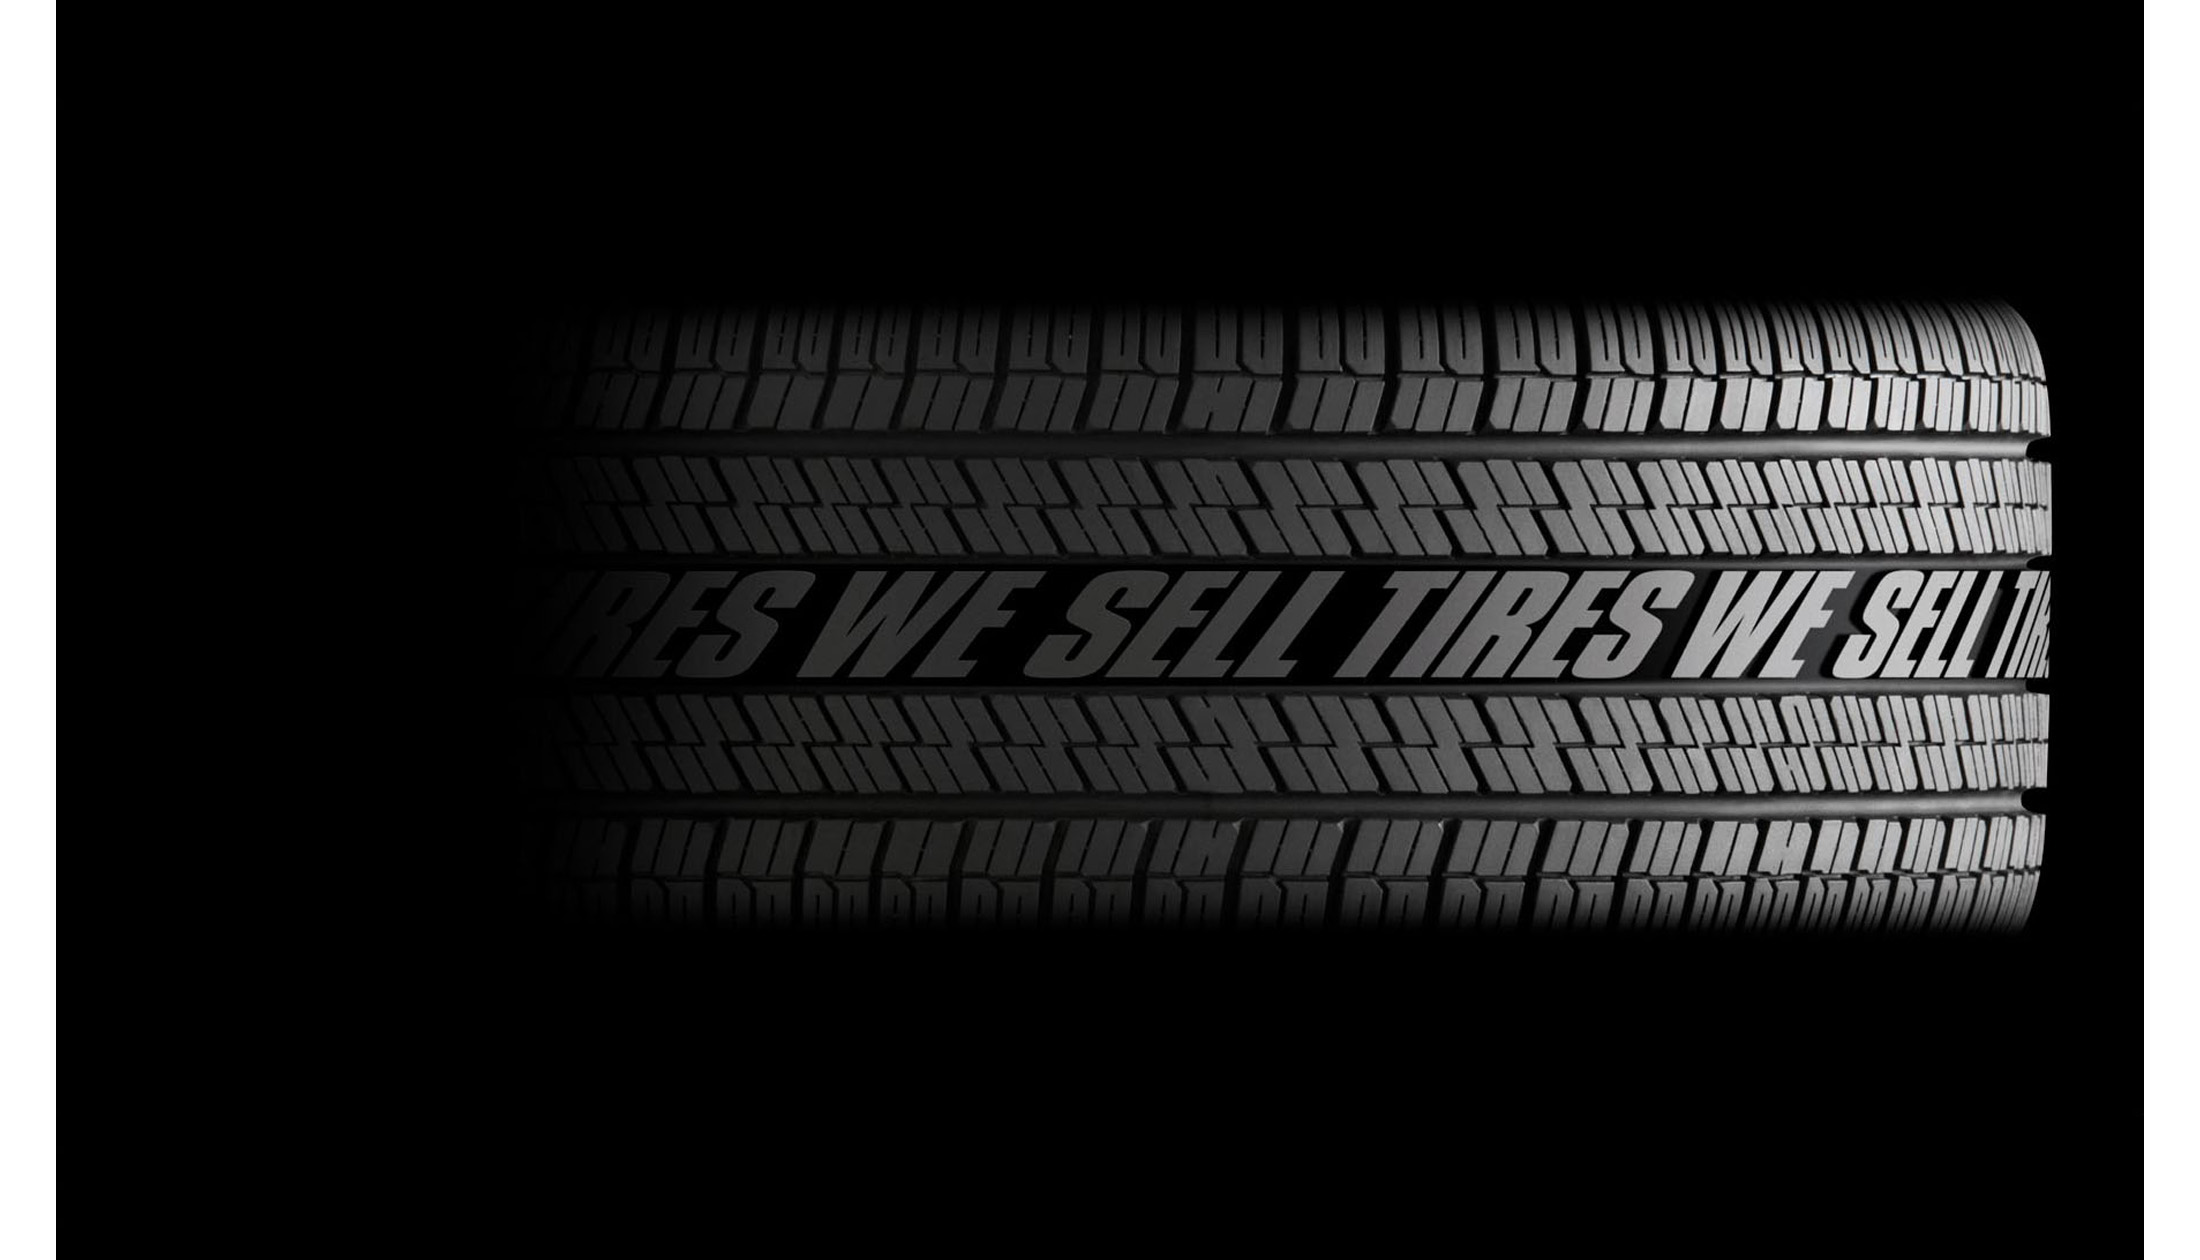 We-sell-tires.jpg